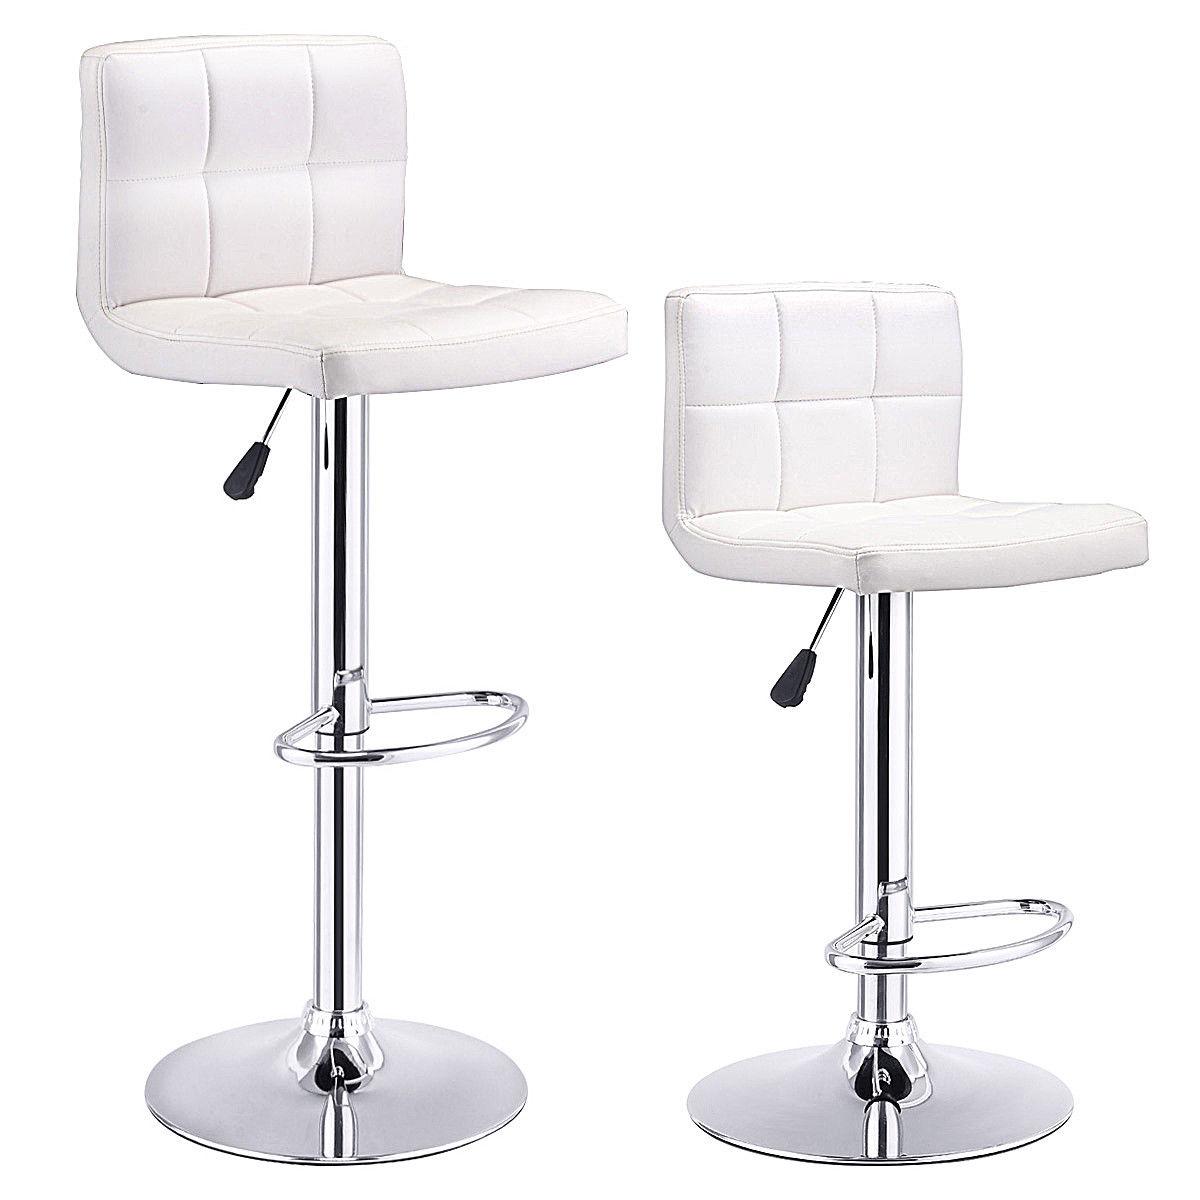 Set Of 2 Bar Stools PU Leather Adjustable Barstool Swivel Pub Chairs White - image 10 de 10